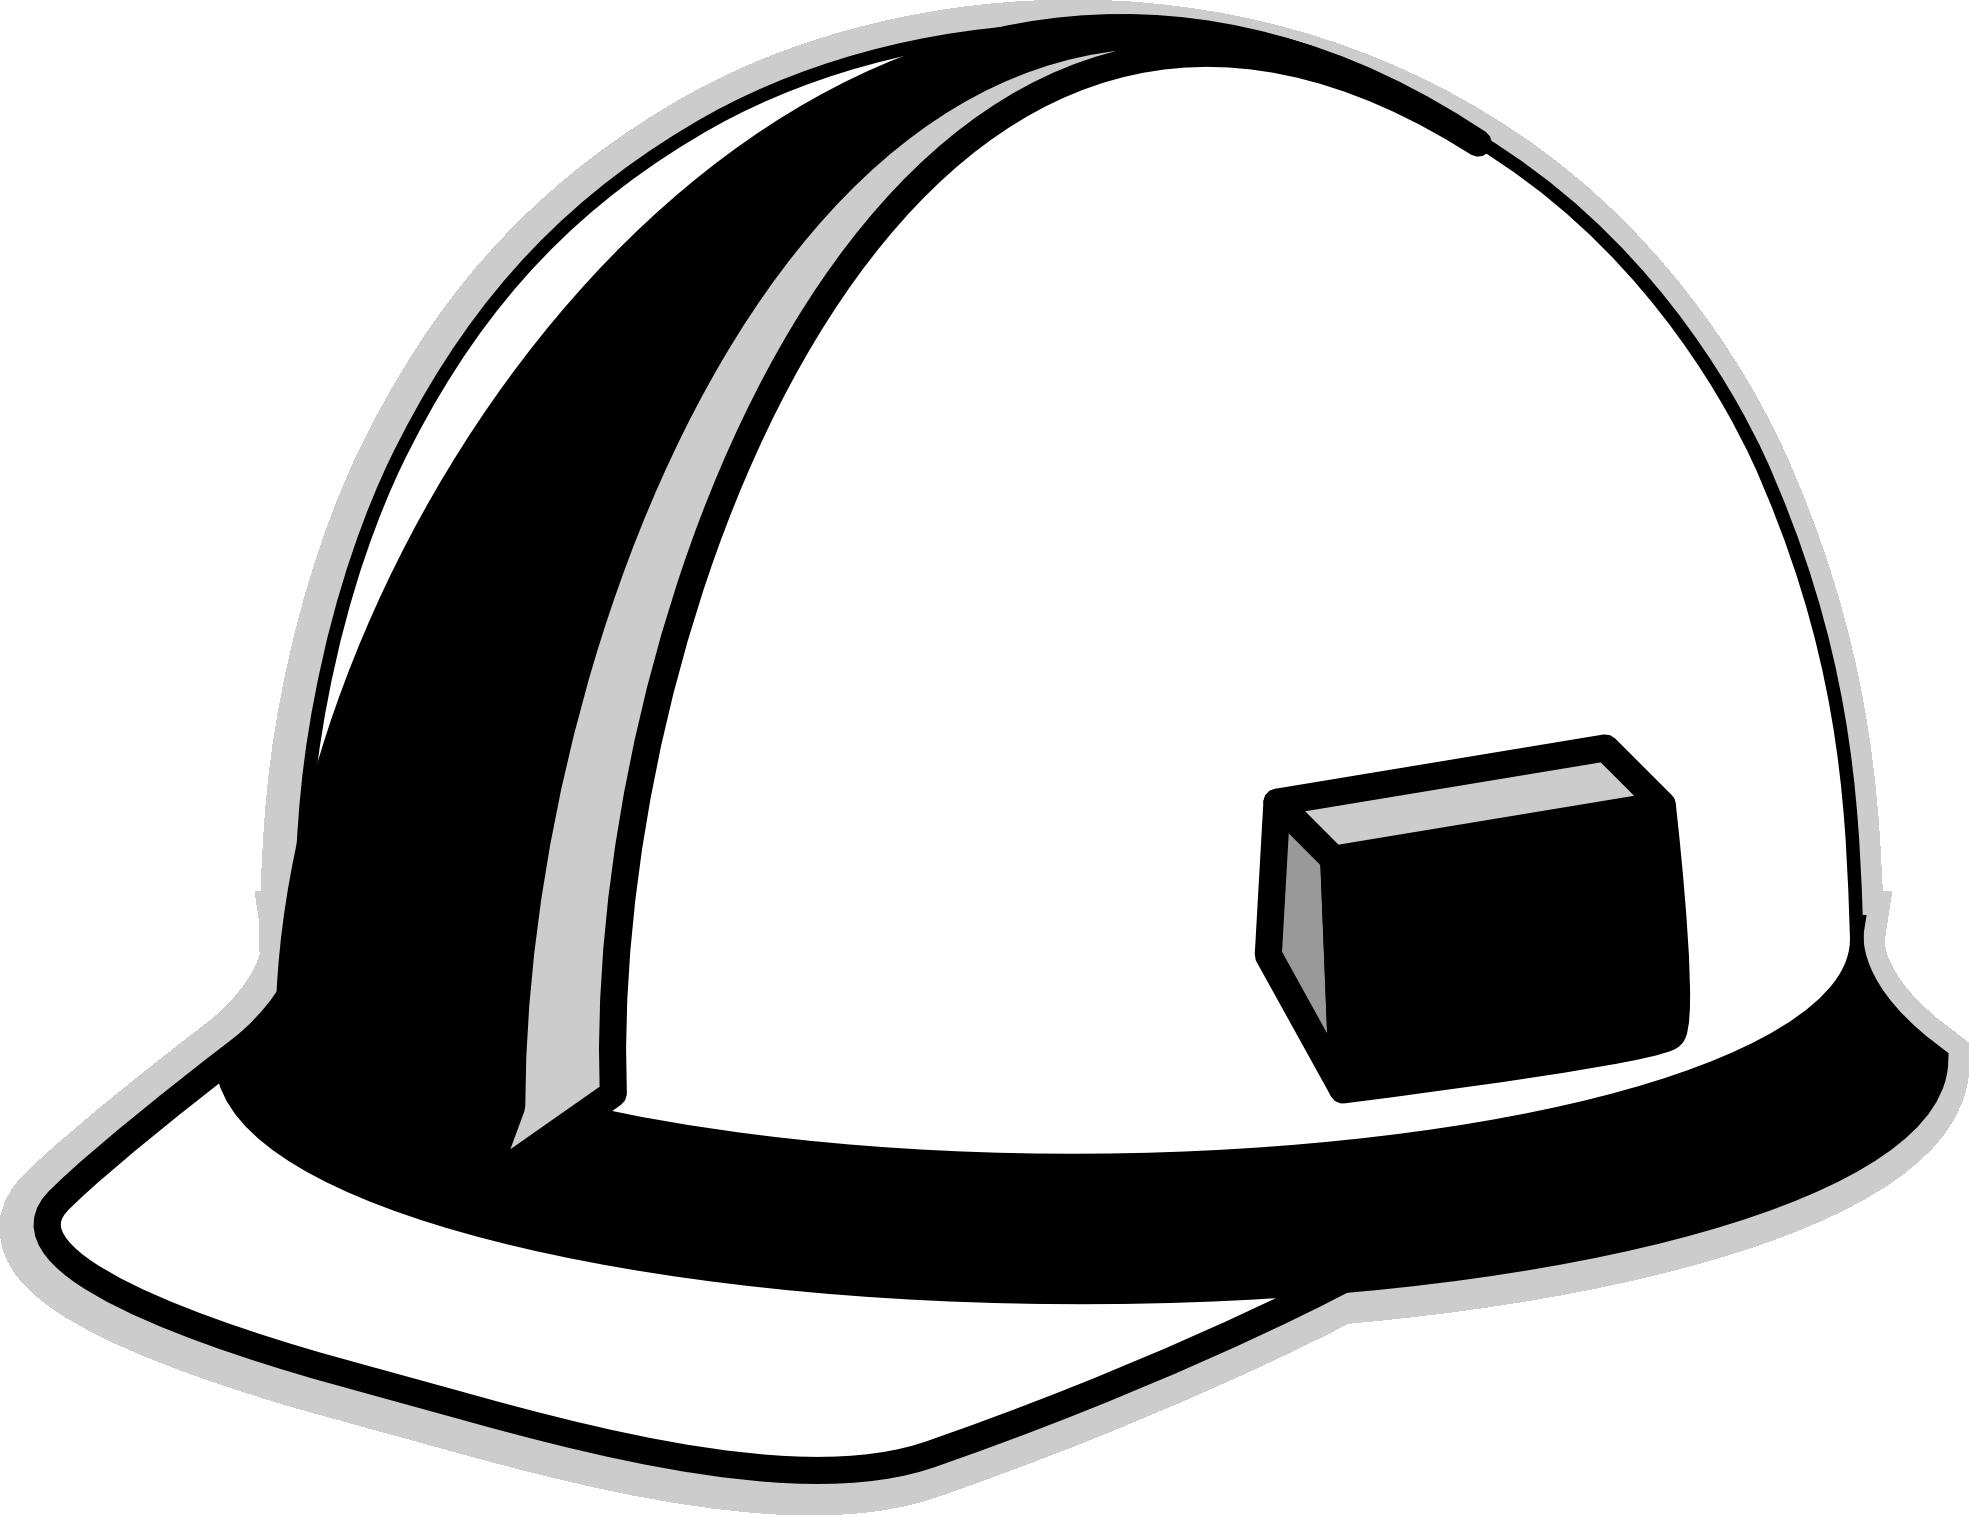 Backwards baseball hat clipart svg black and white Hat Clipart Black And White svg black and white